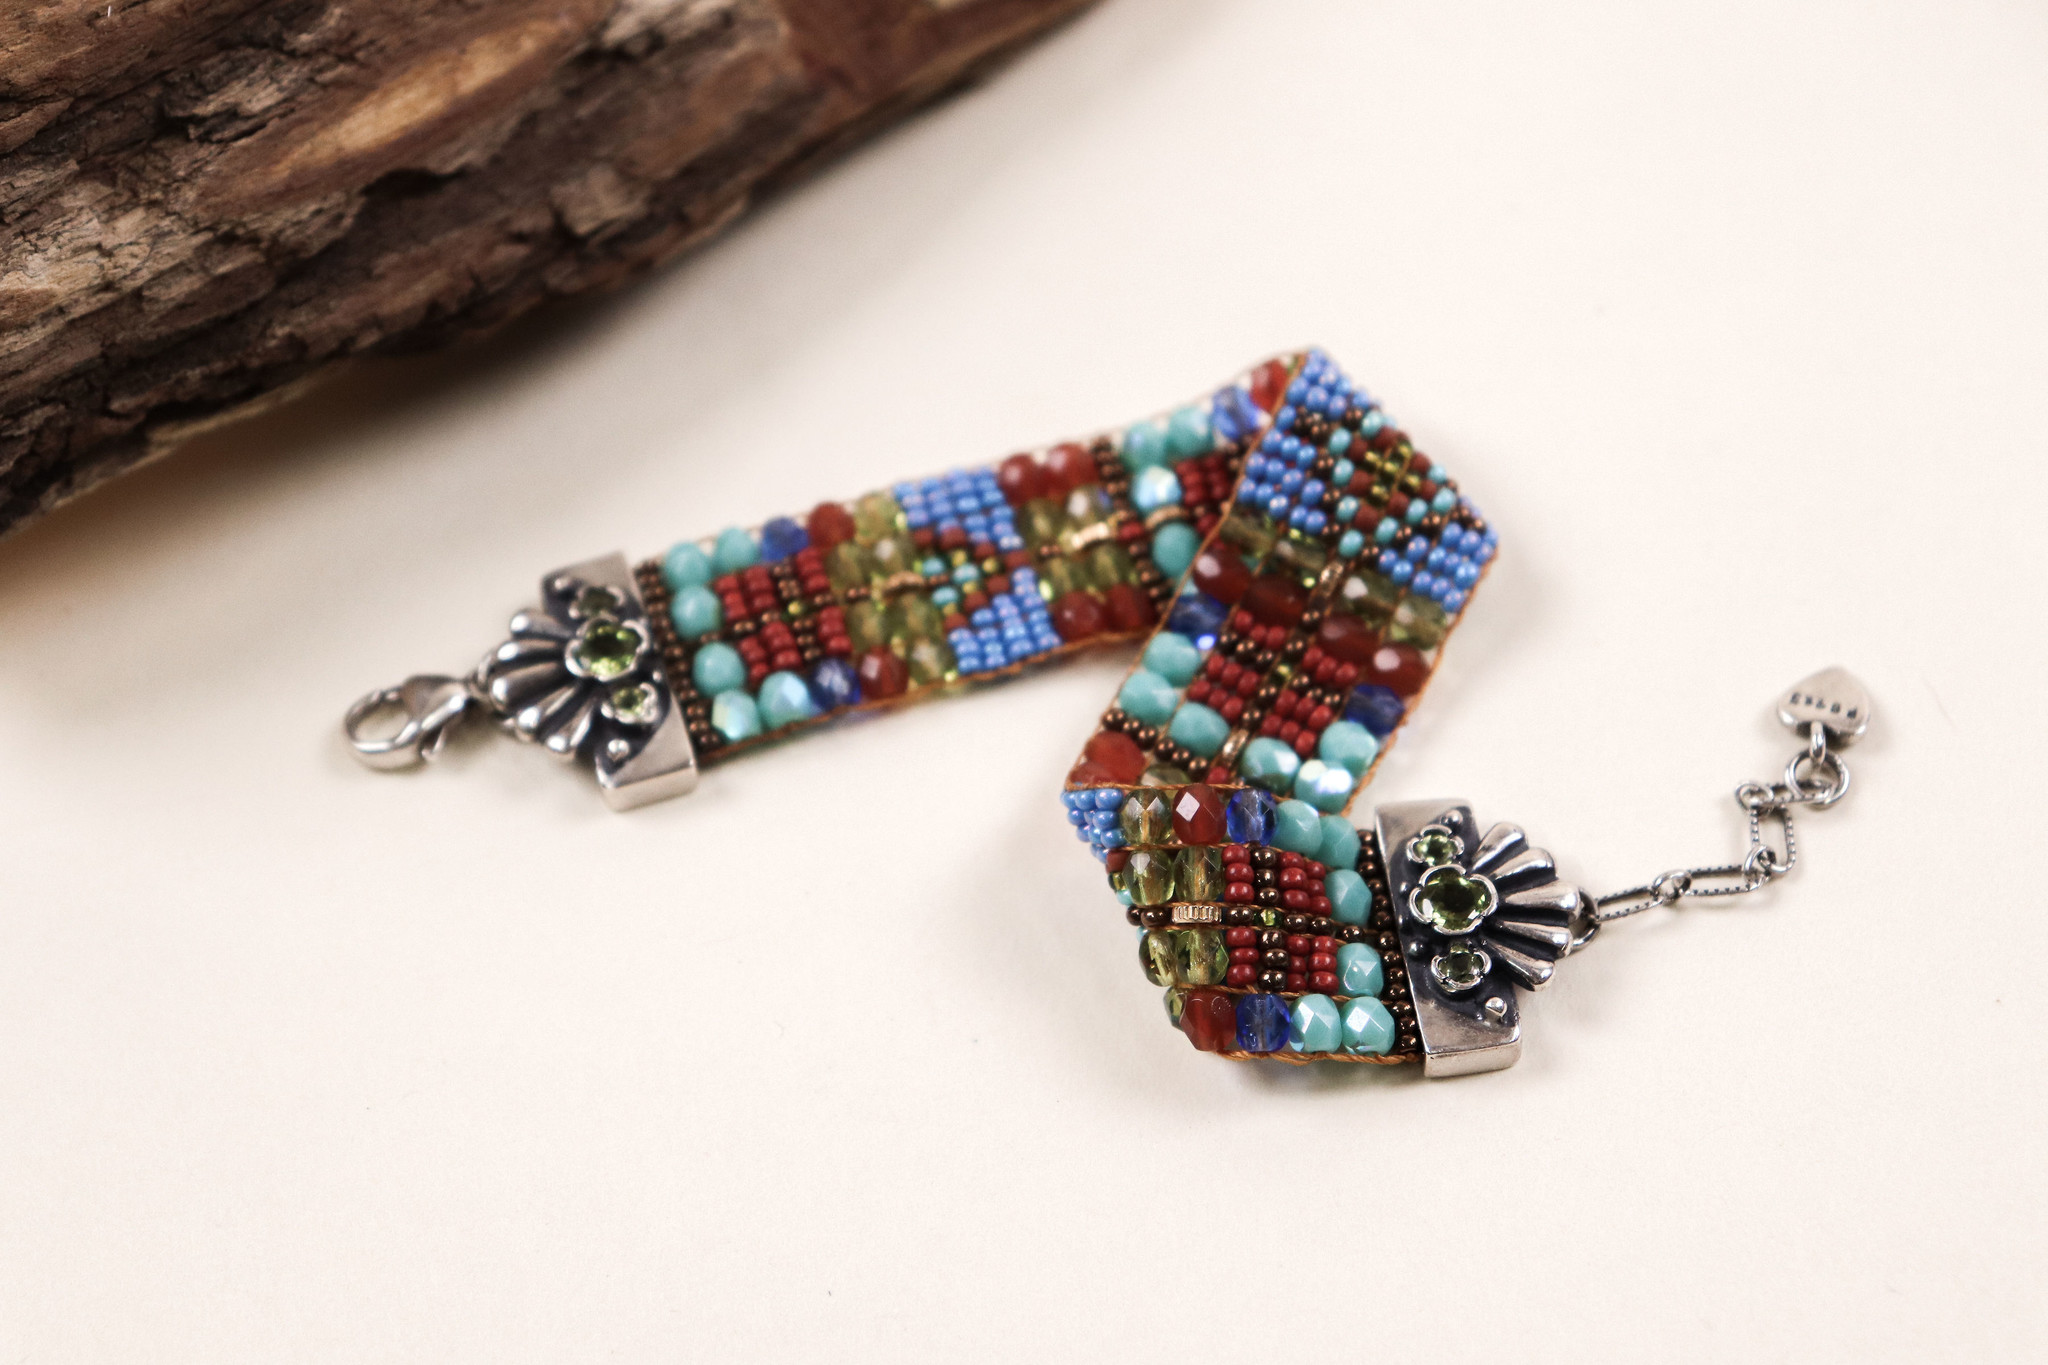 Peyote Bird Designs Chili Rose Green Stone Clasp Bracelet